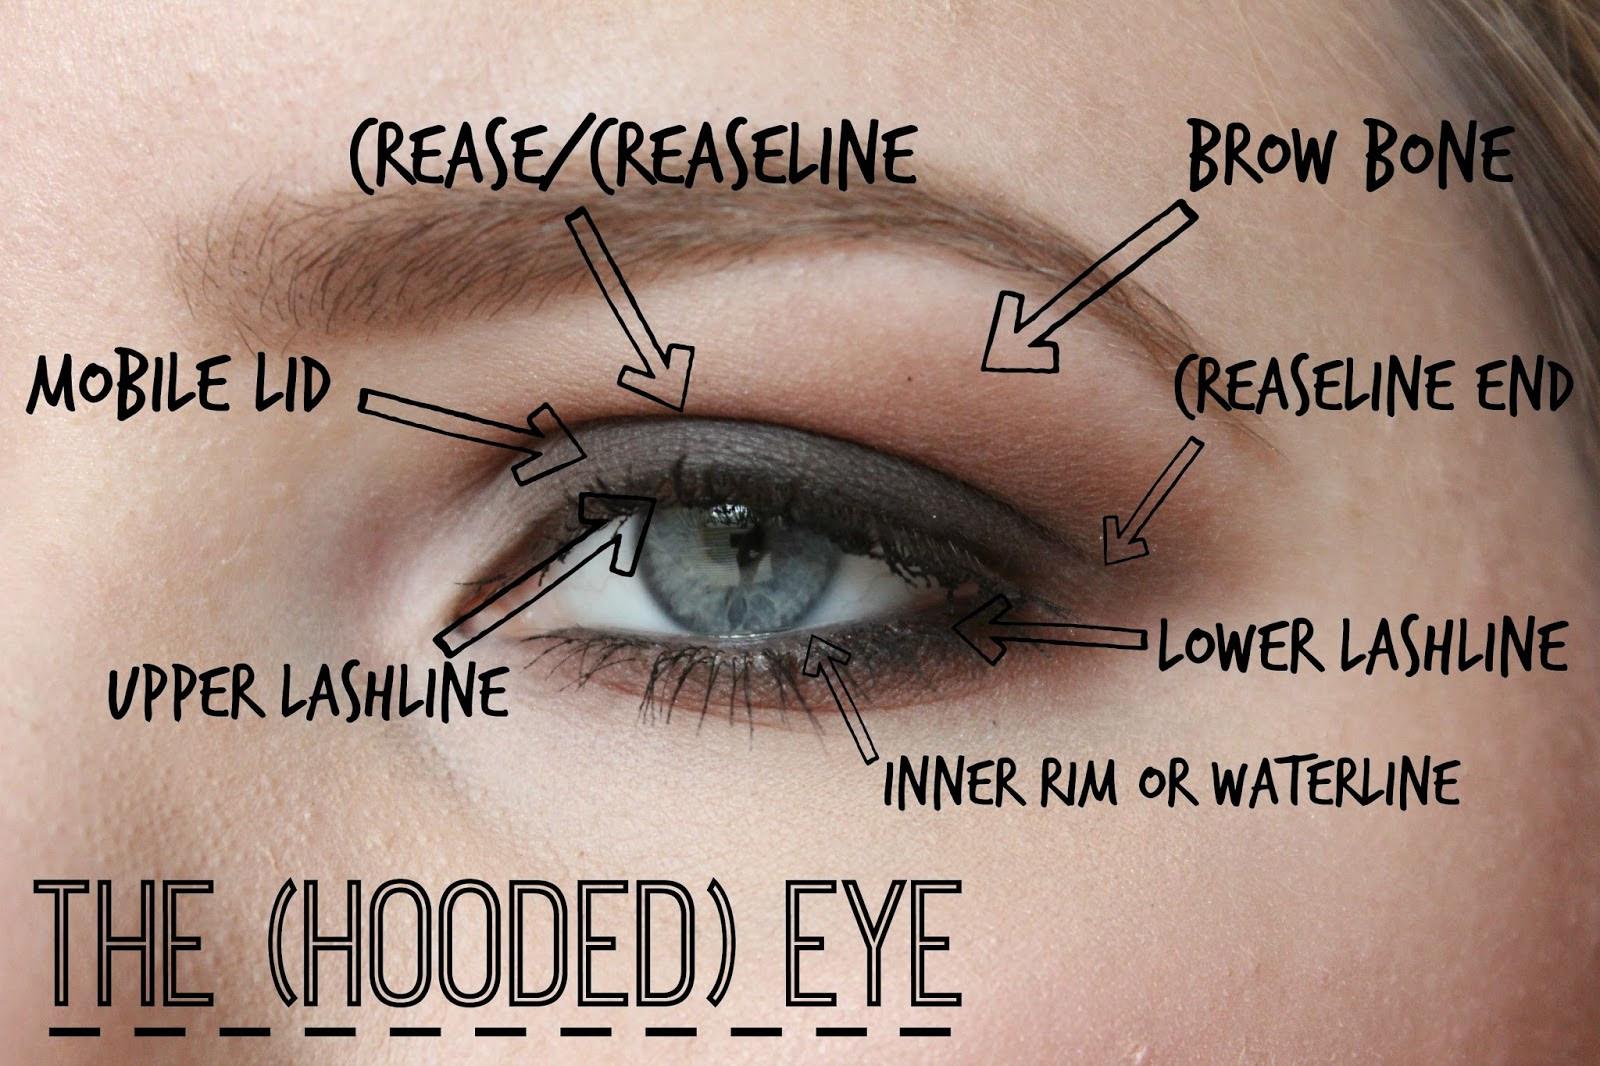 Makeup Tutorial For Hooded Eyes | The Expert Guide - L'Oréal Paris